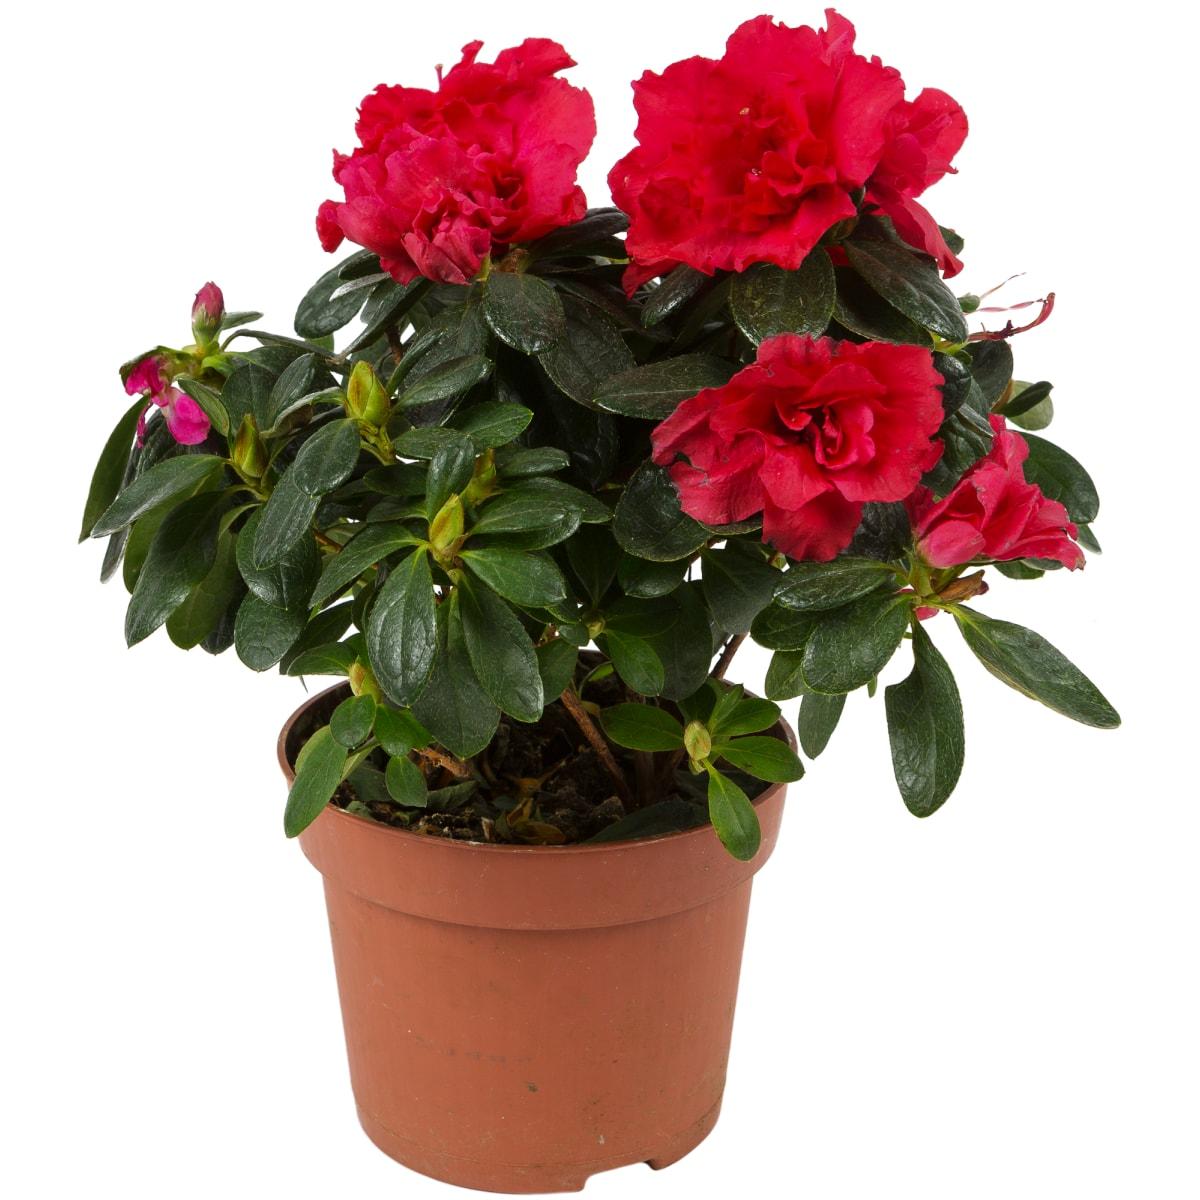 для азалия комнатное растение фото адлер характеру